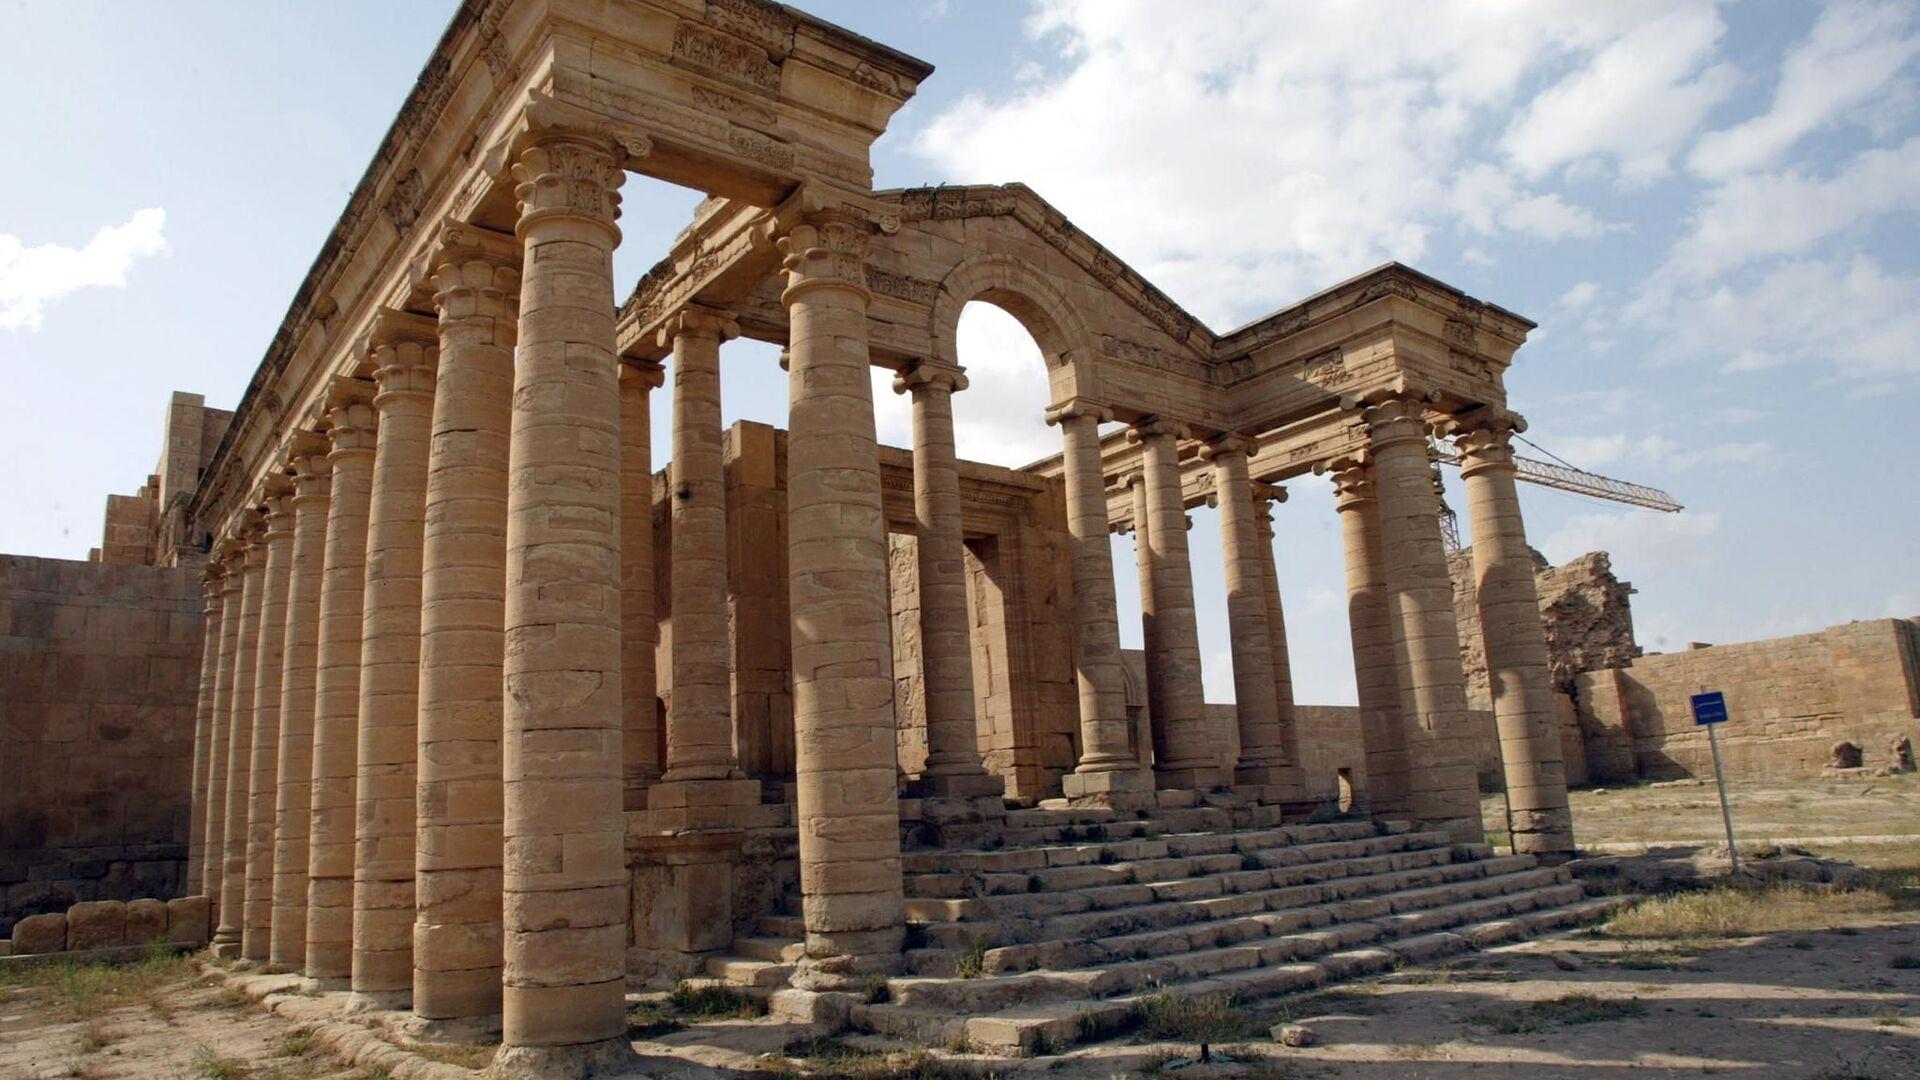 Tempio ellenistico ad Hatra - Sputnik Italia, 1920, 04.09.2021